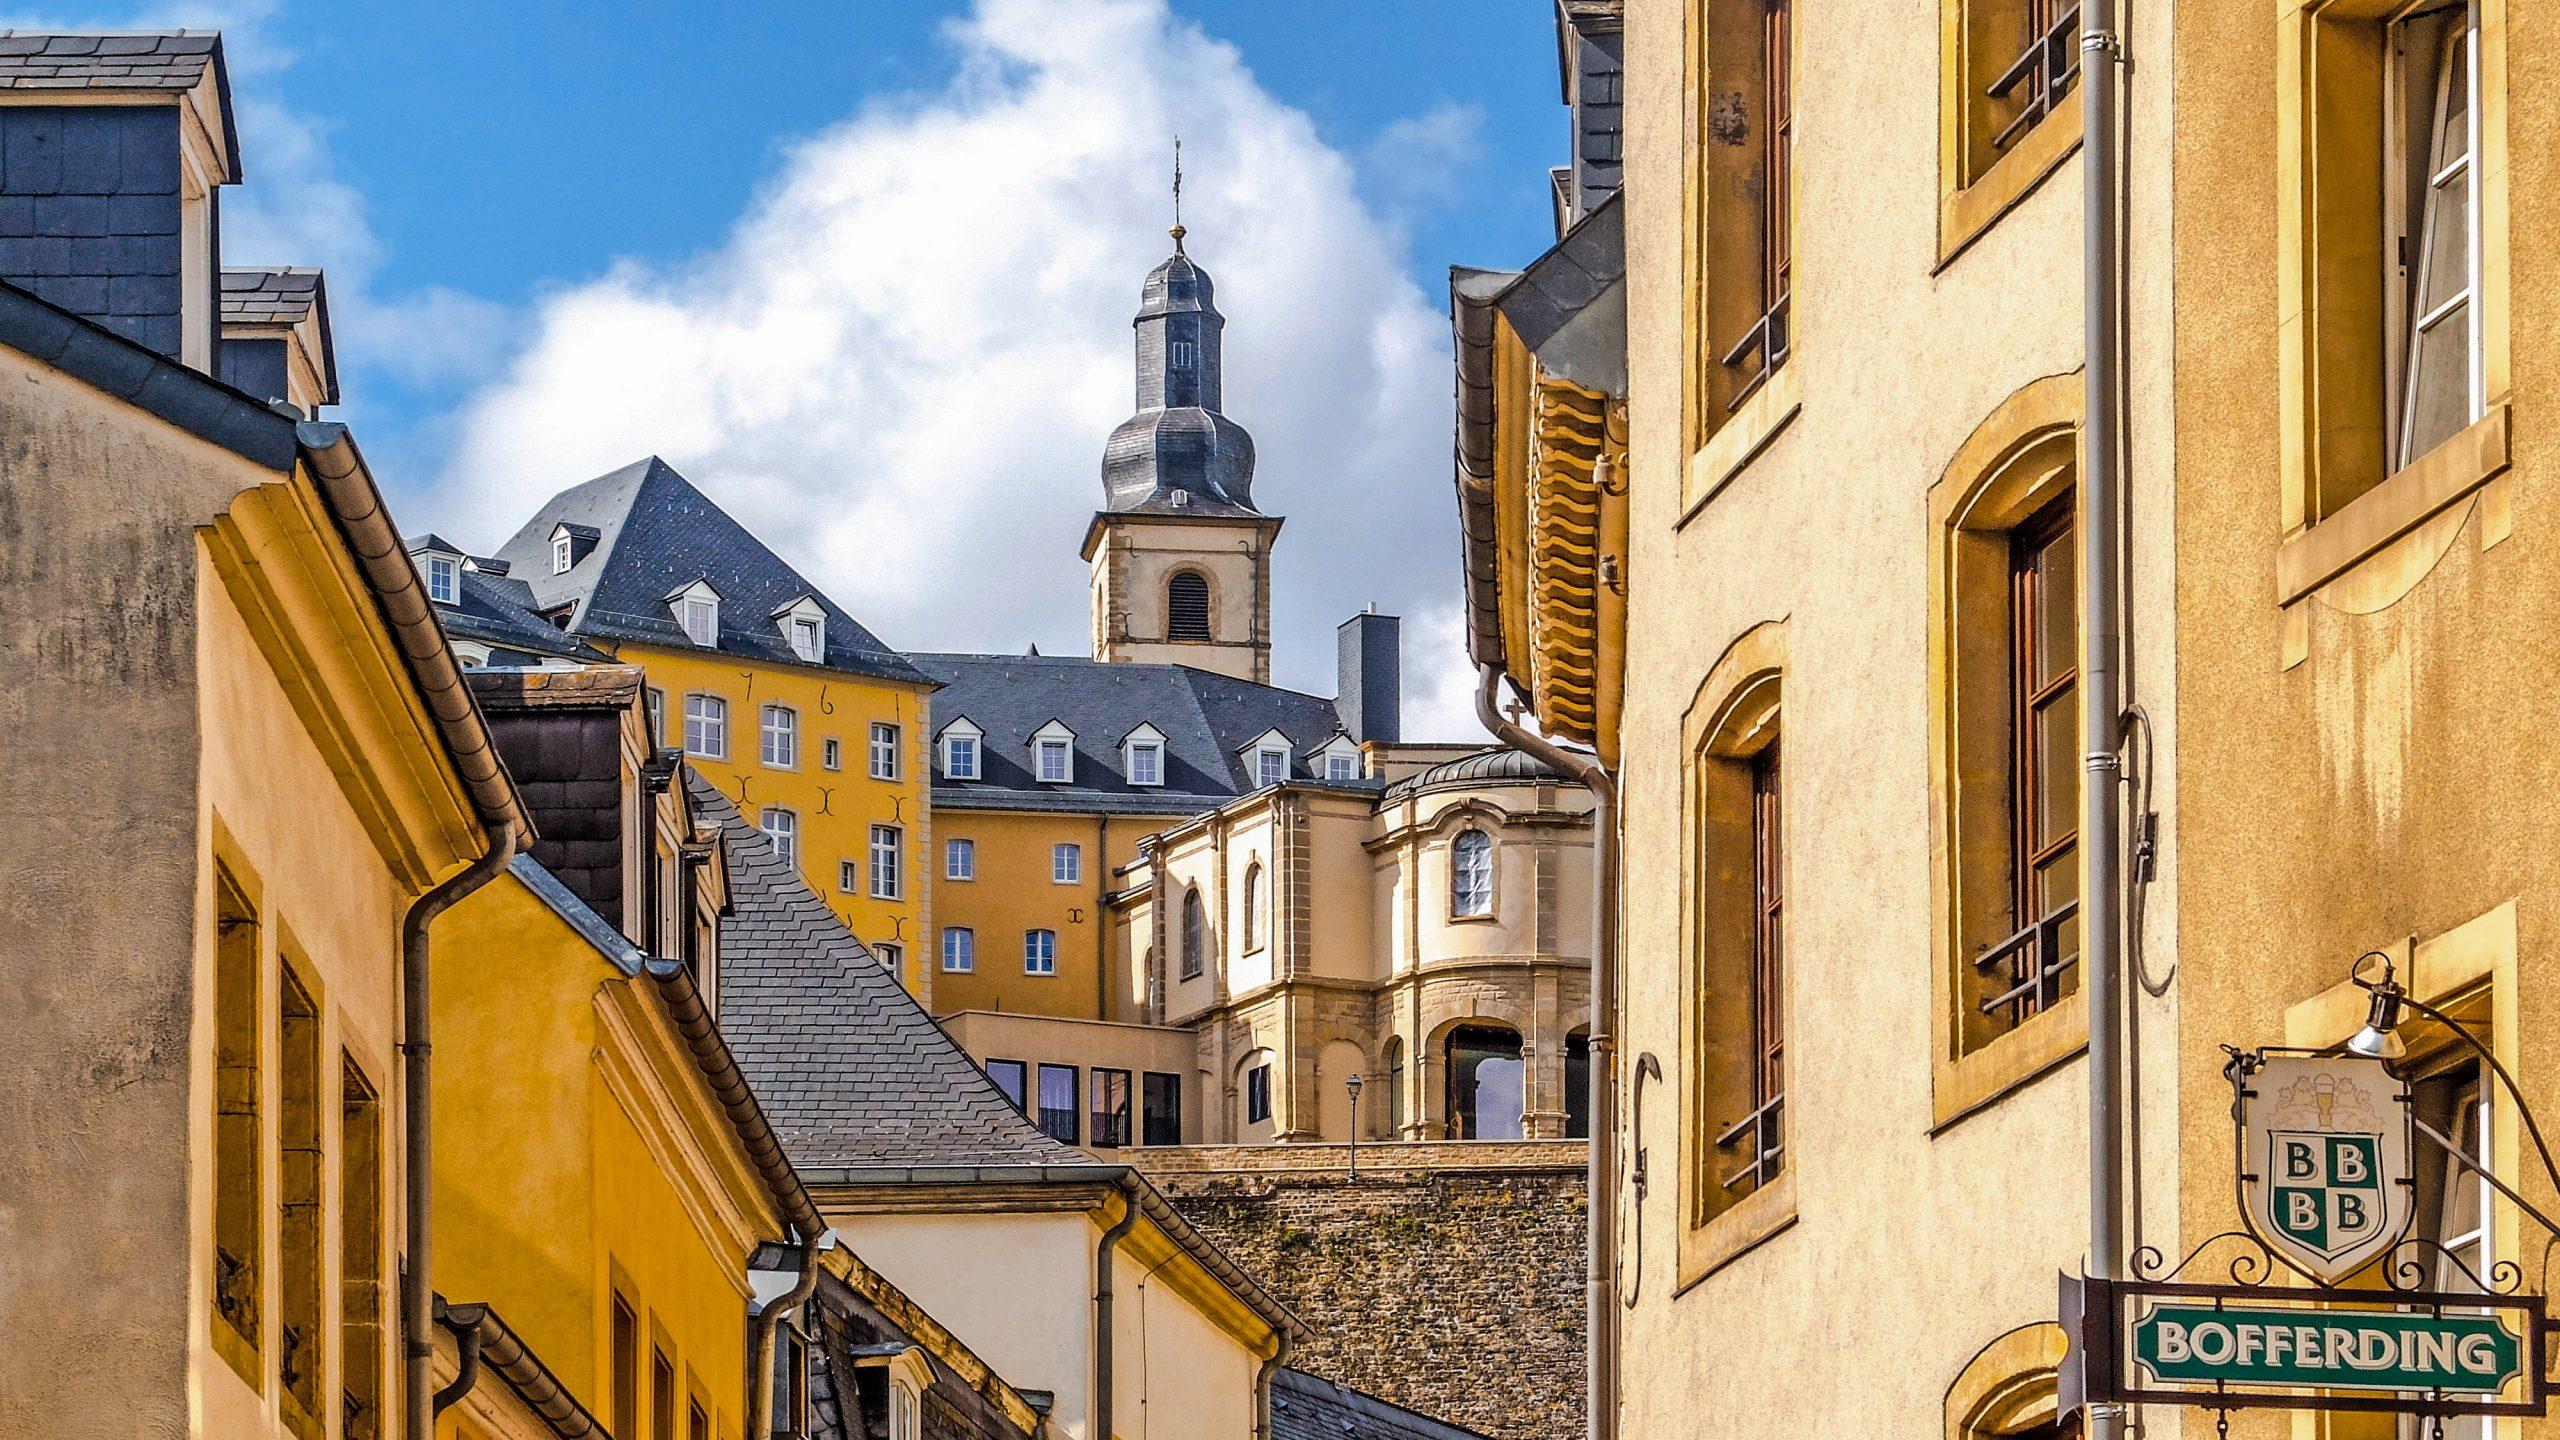 ehir grund scaled - Grund ve Hamilius : Lüksemburg'un Kalbi